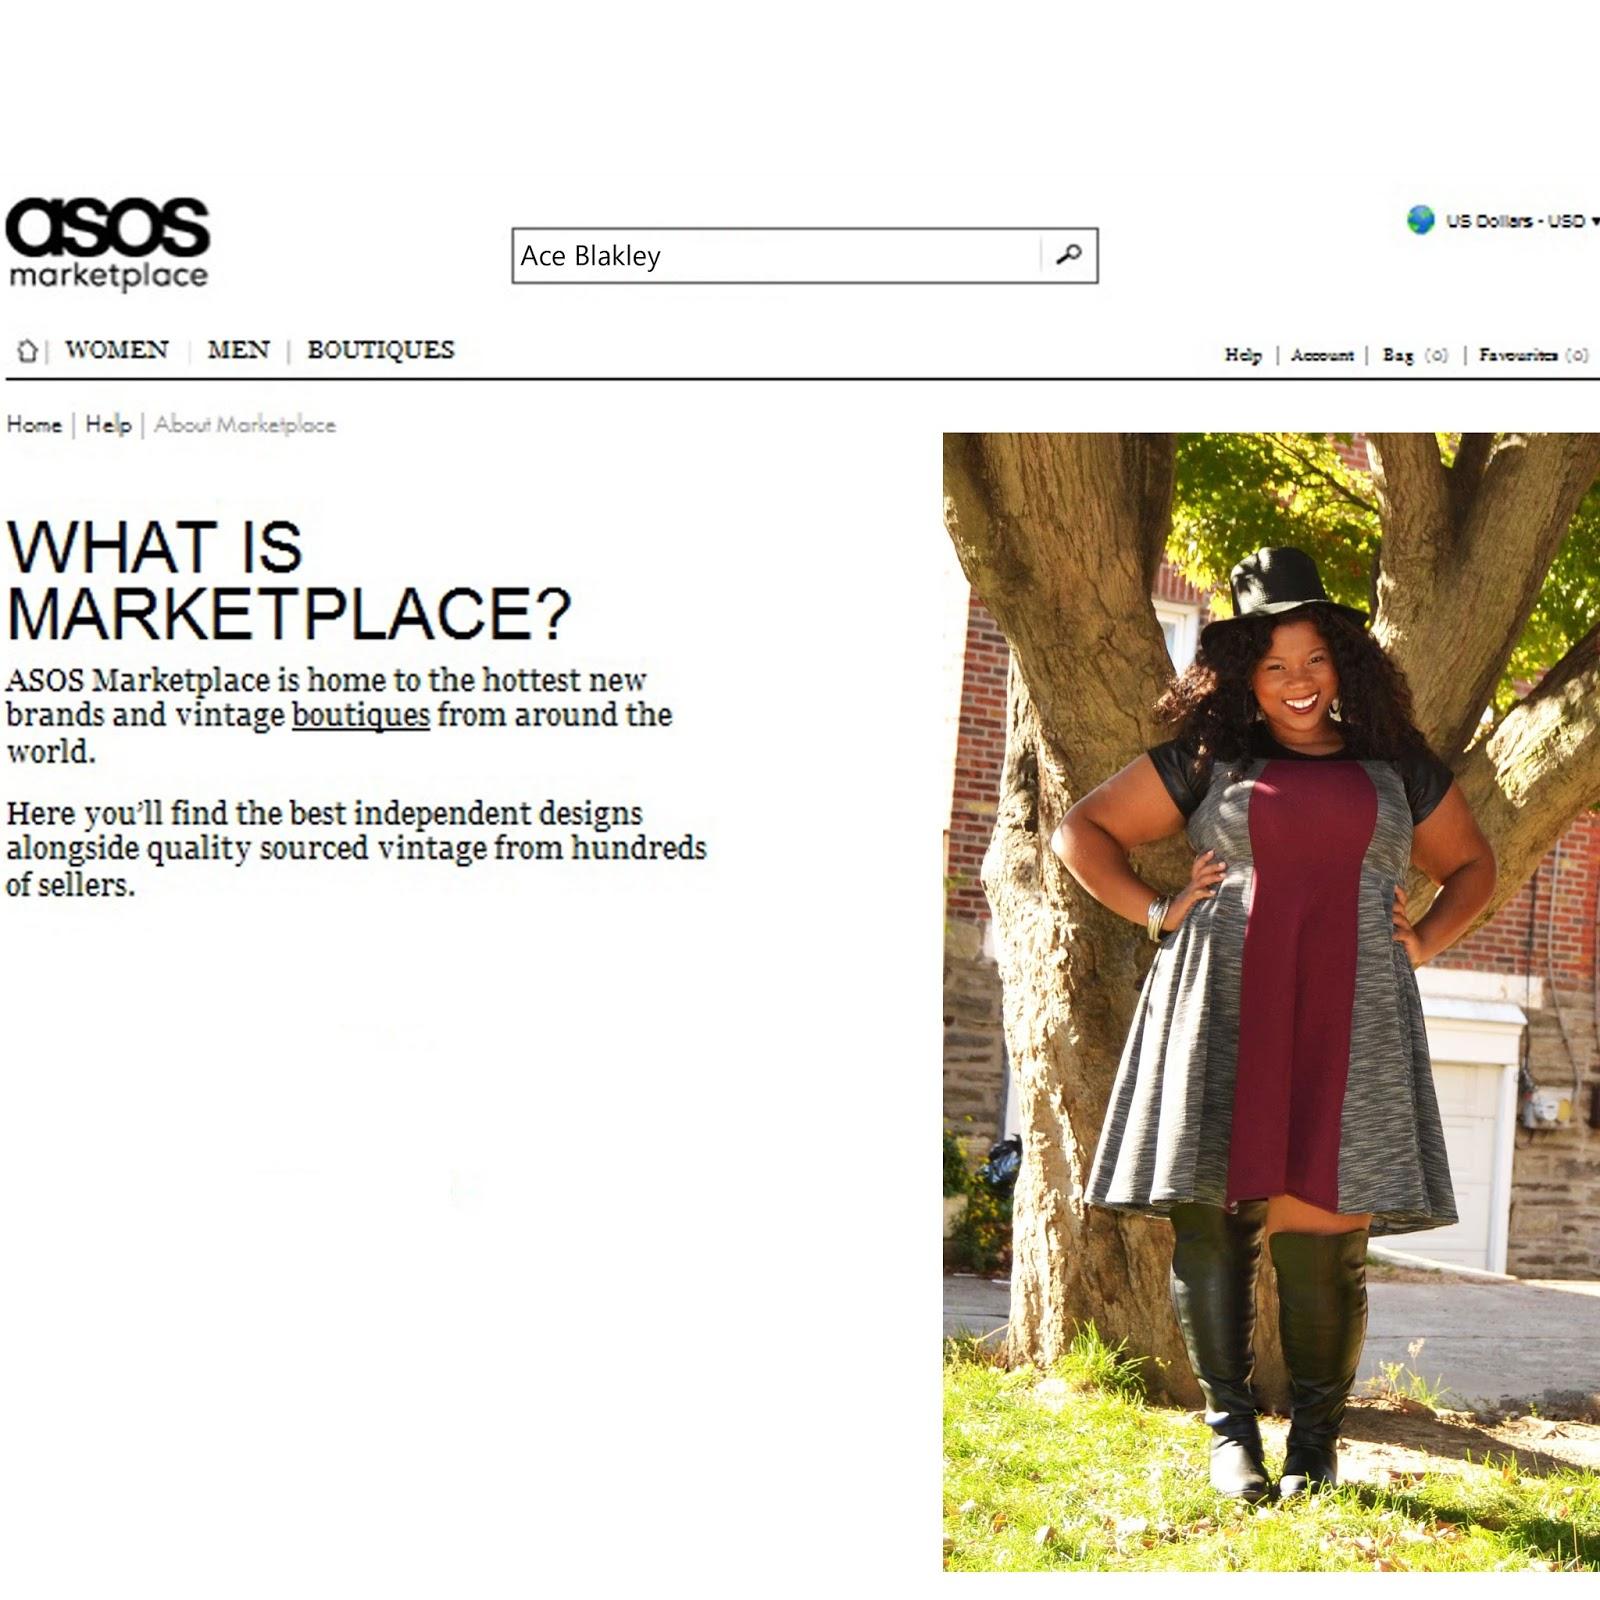 ace blakley on asos marketplace